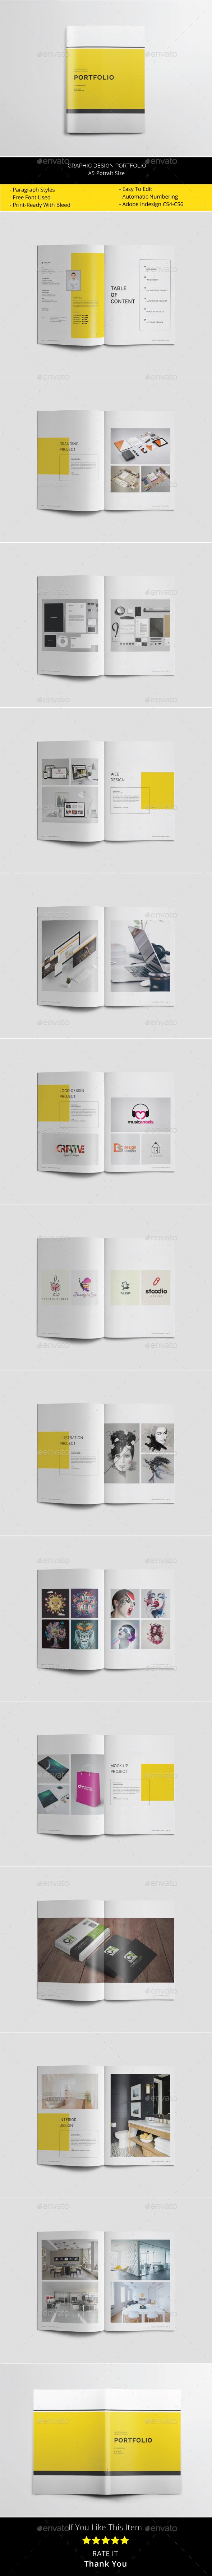 A5 Graphic Design Portfolio - Portfolio Brochures